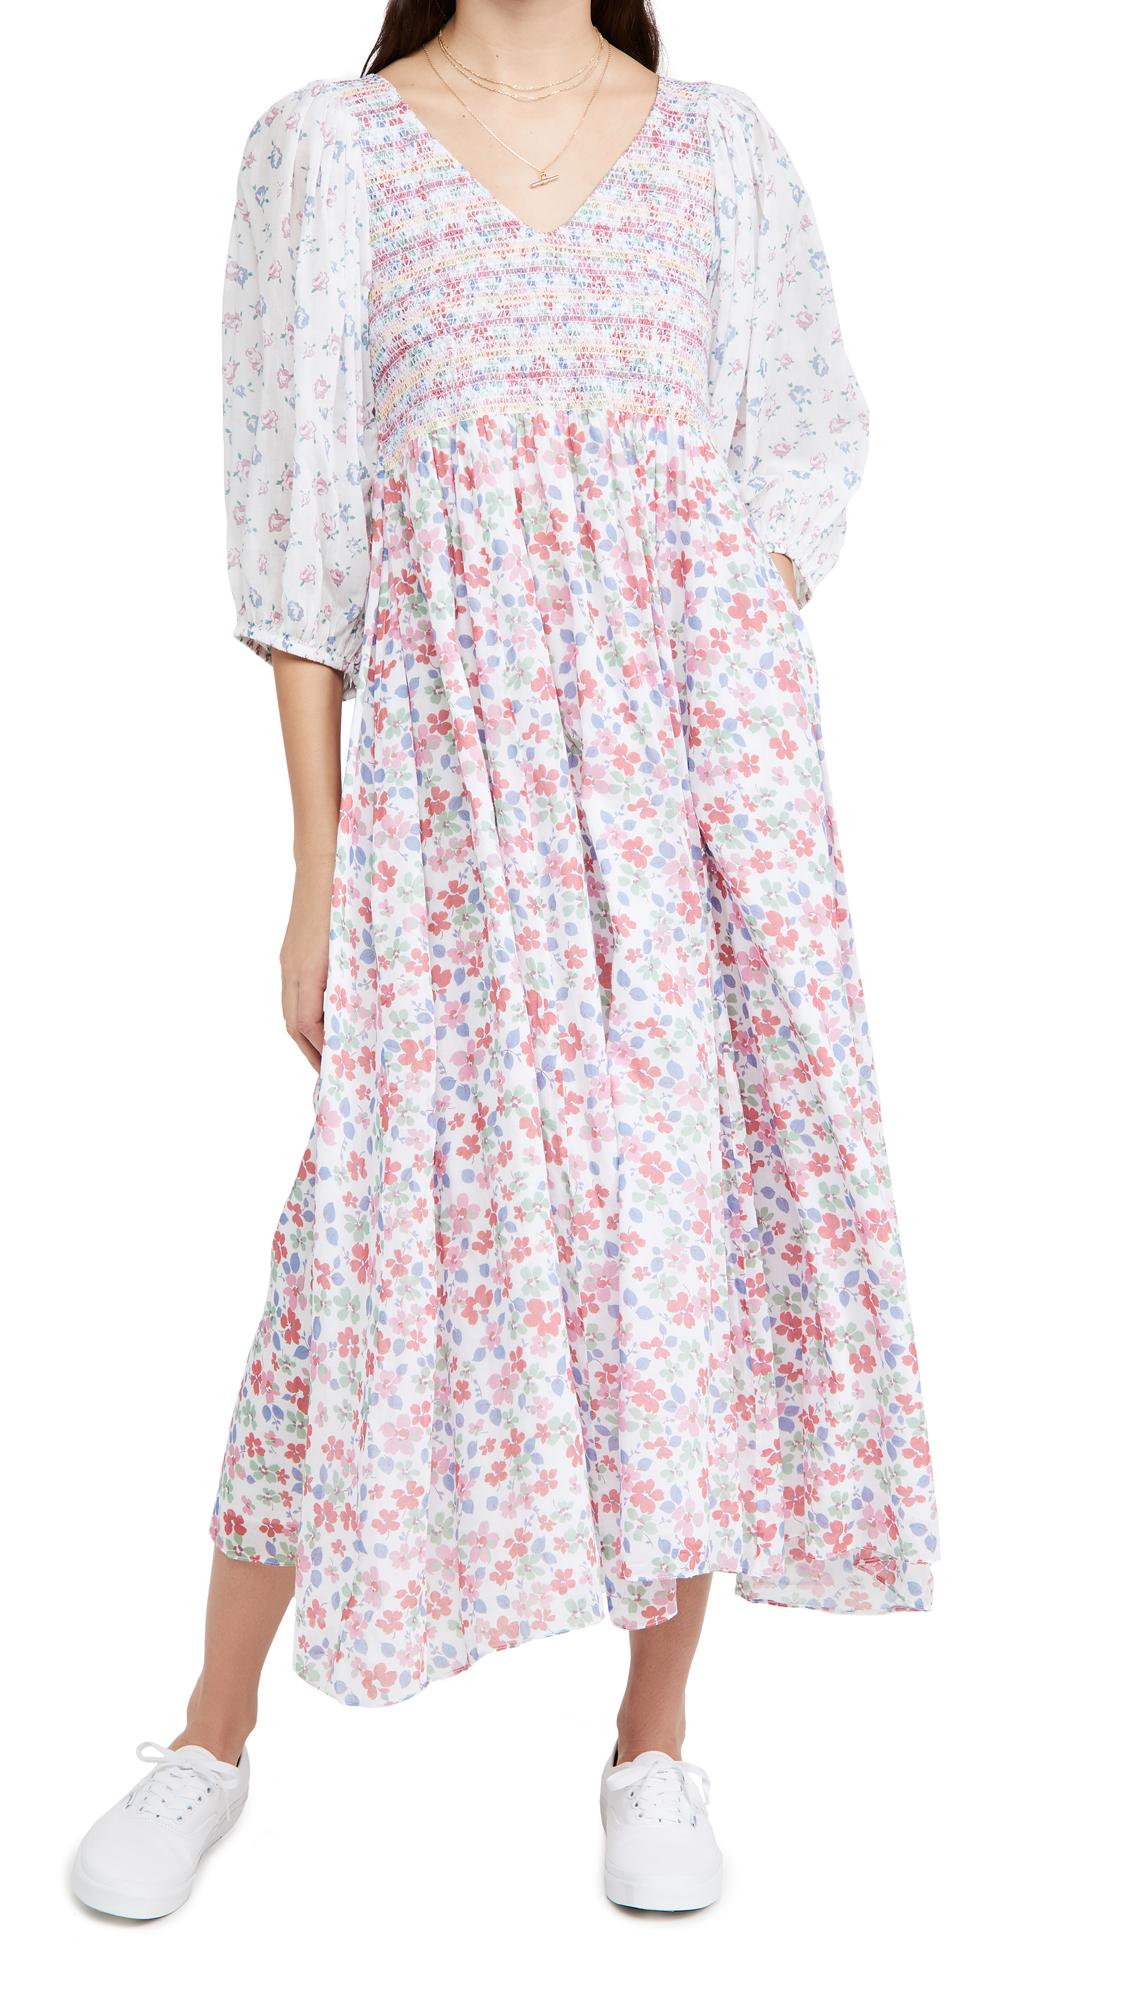 Loveshackfancy Cottons ANALIA DRESS